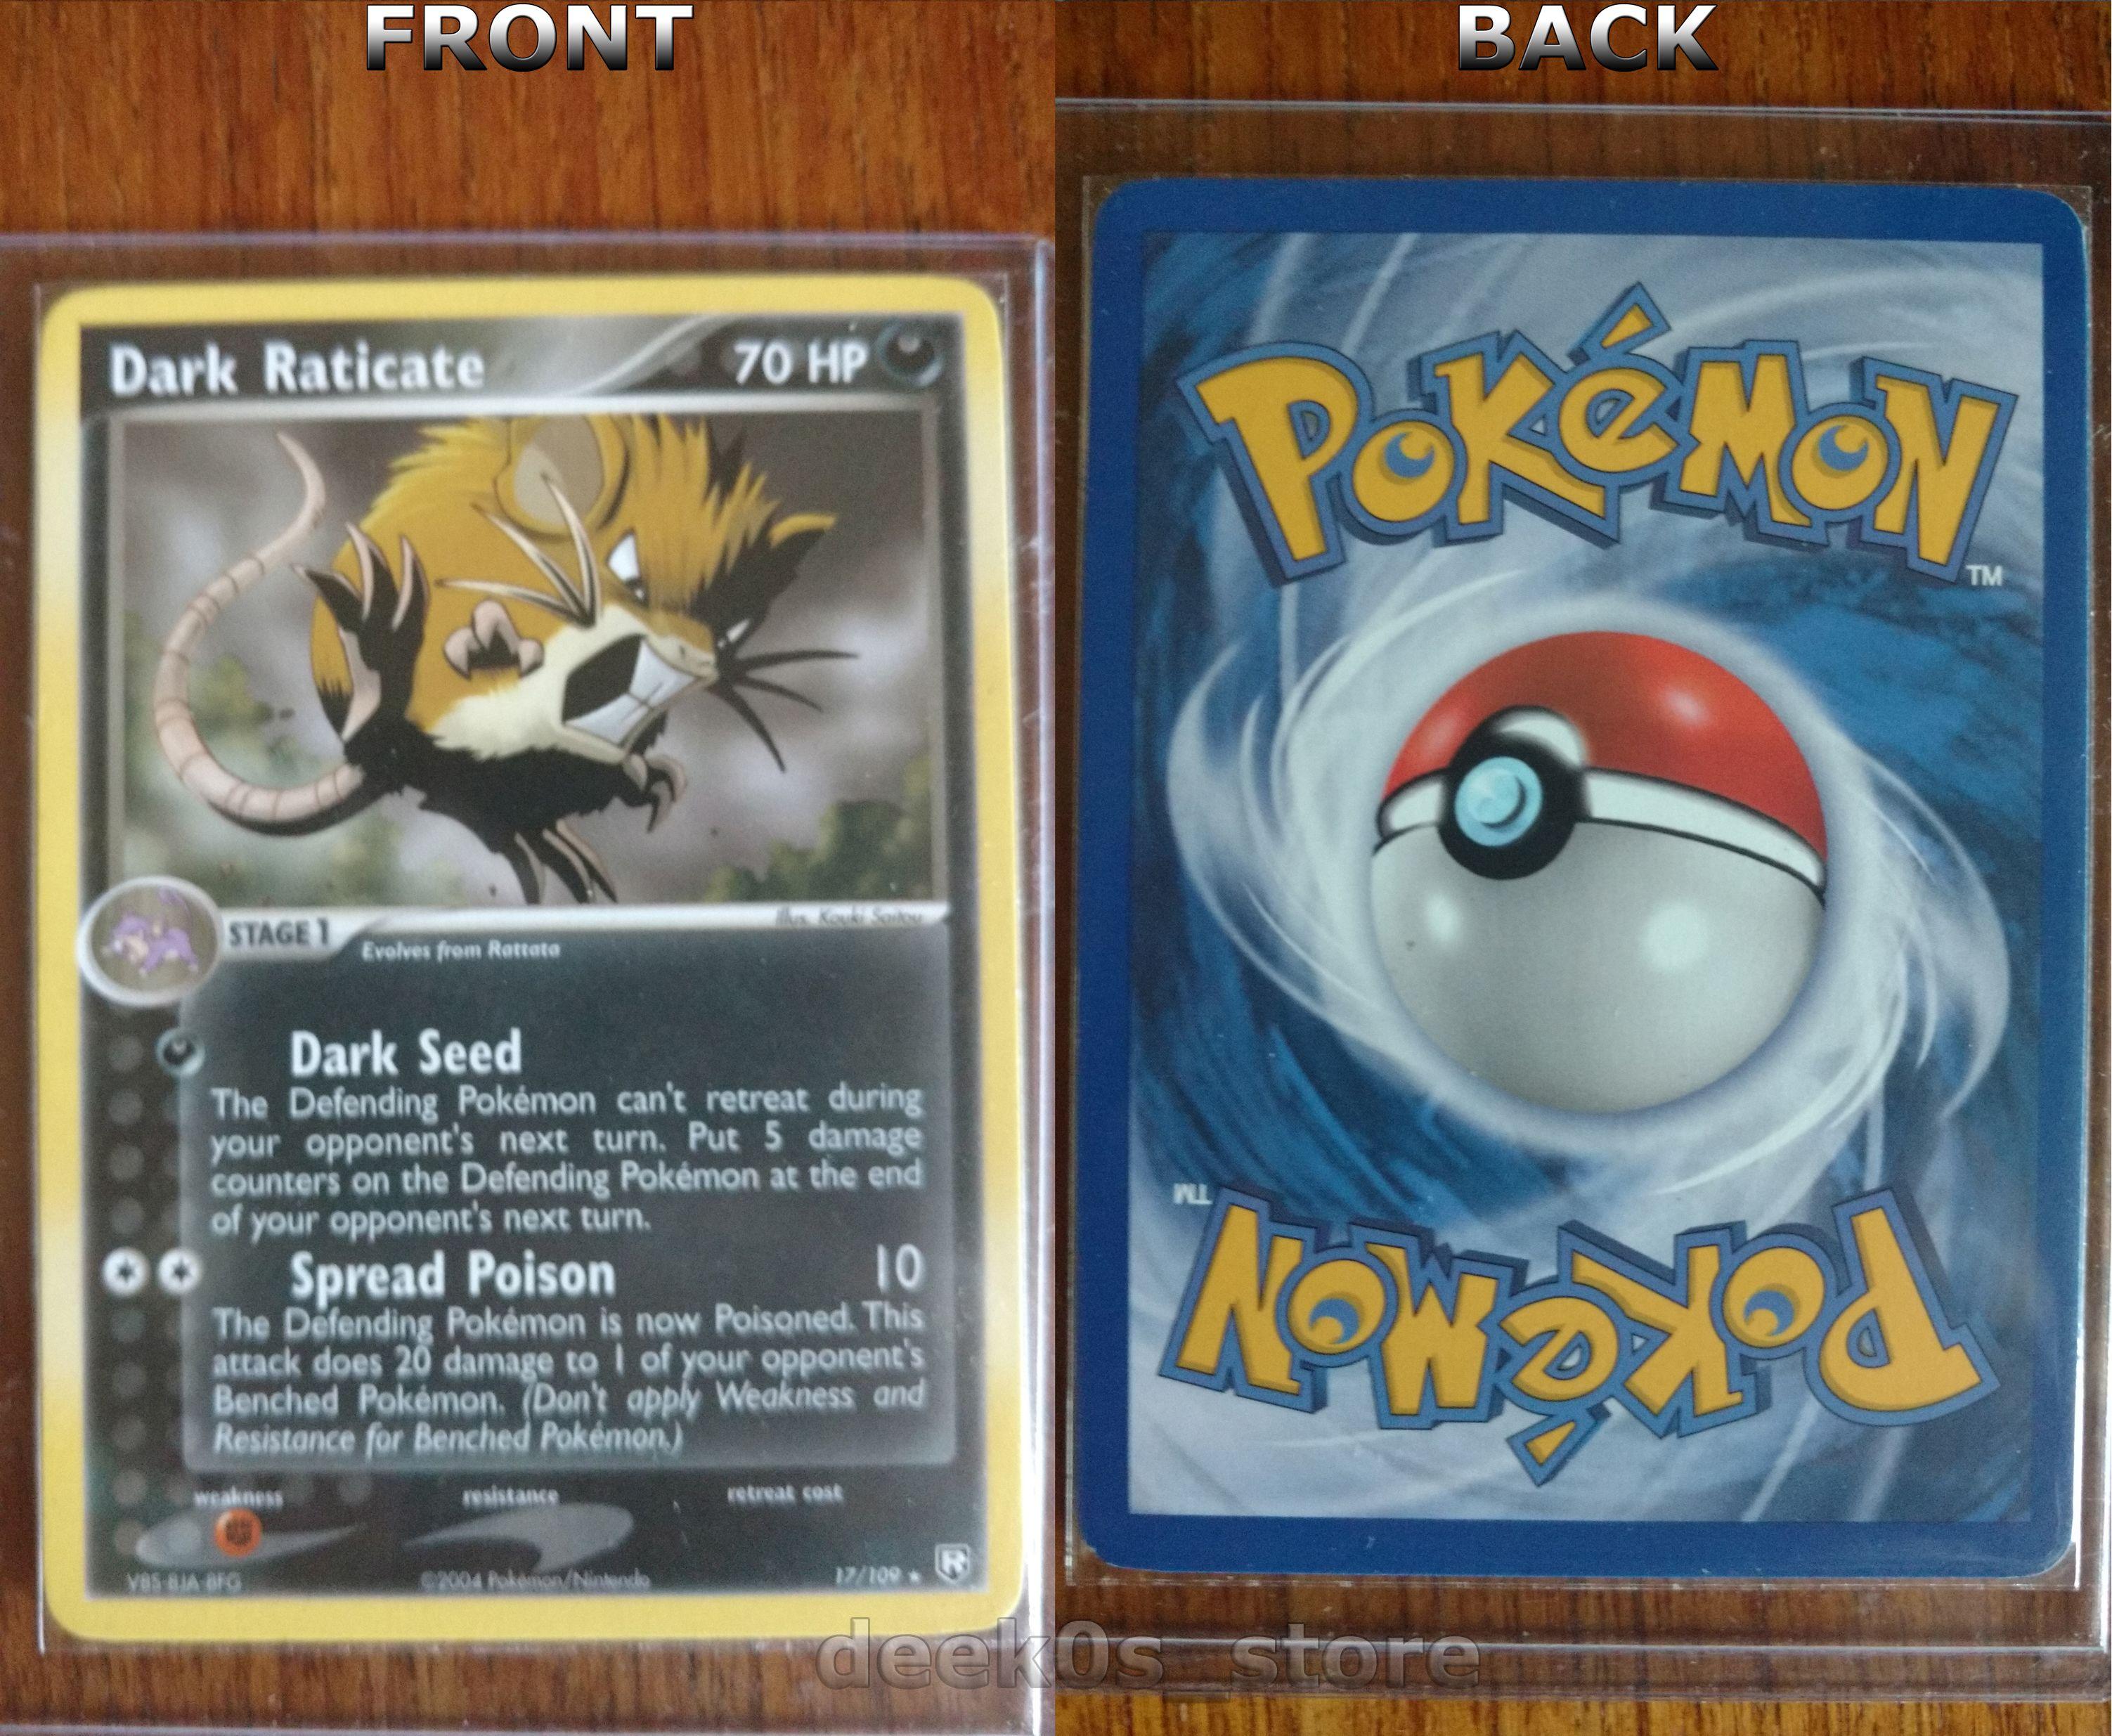 Dark raticate 17109 team rocket returns is a rare pokemon